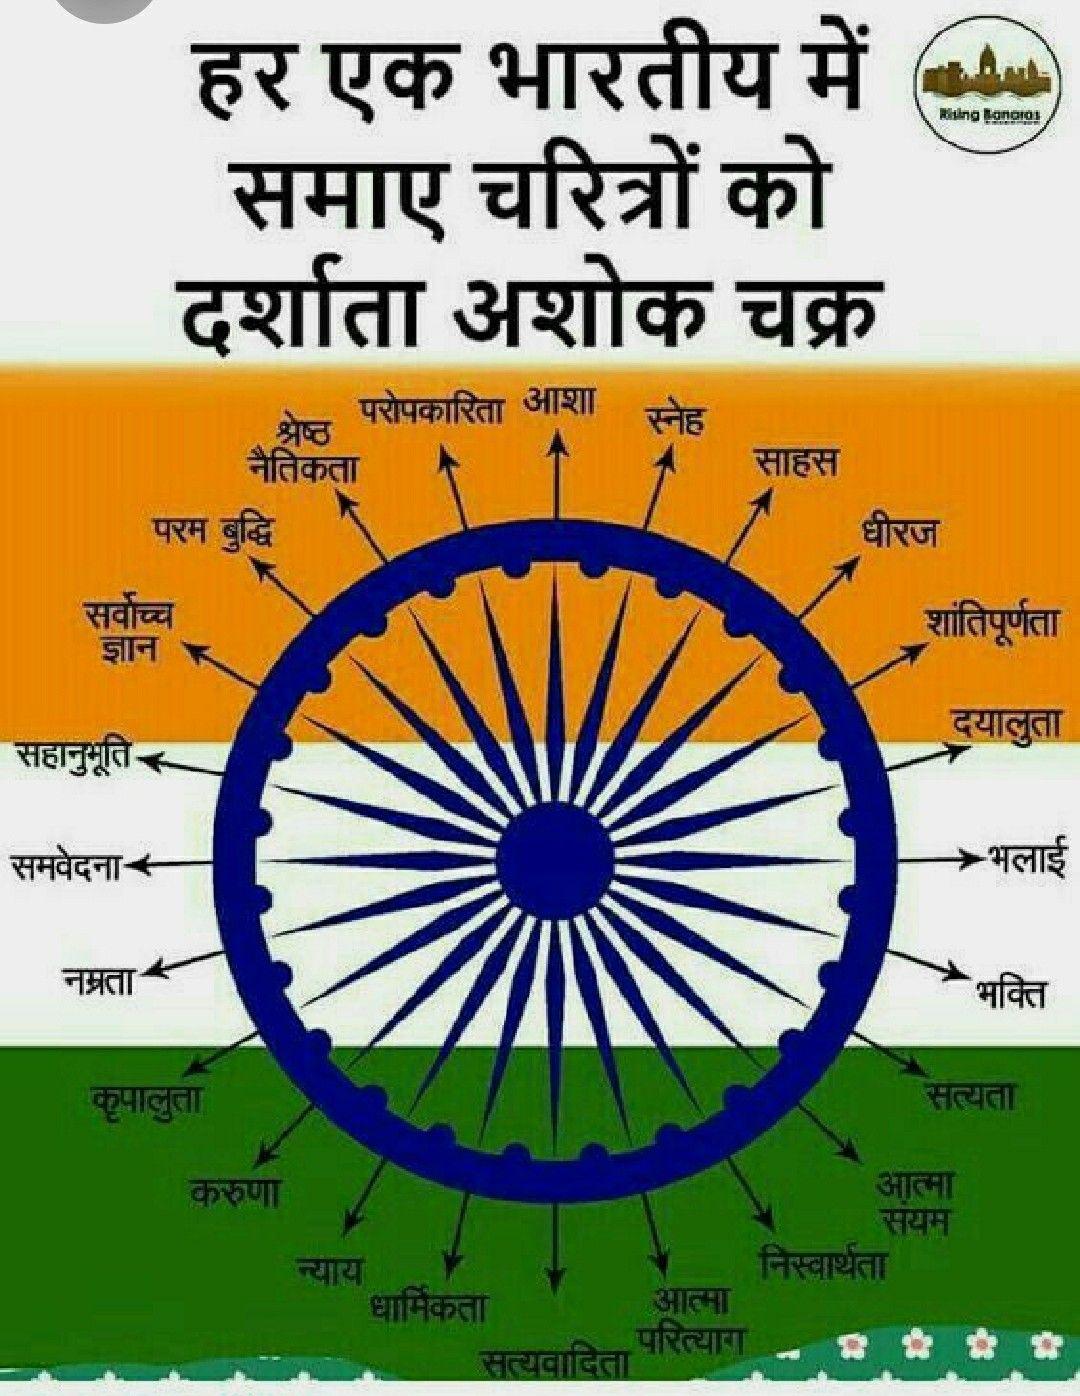 Ashoka Chakra Of Our National Flag In